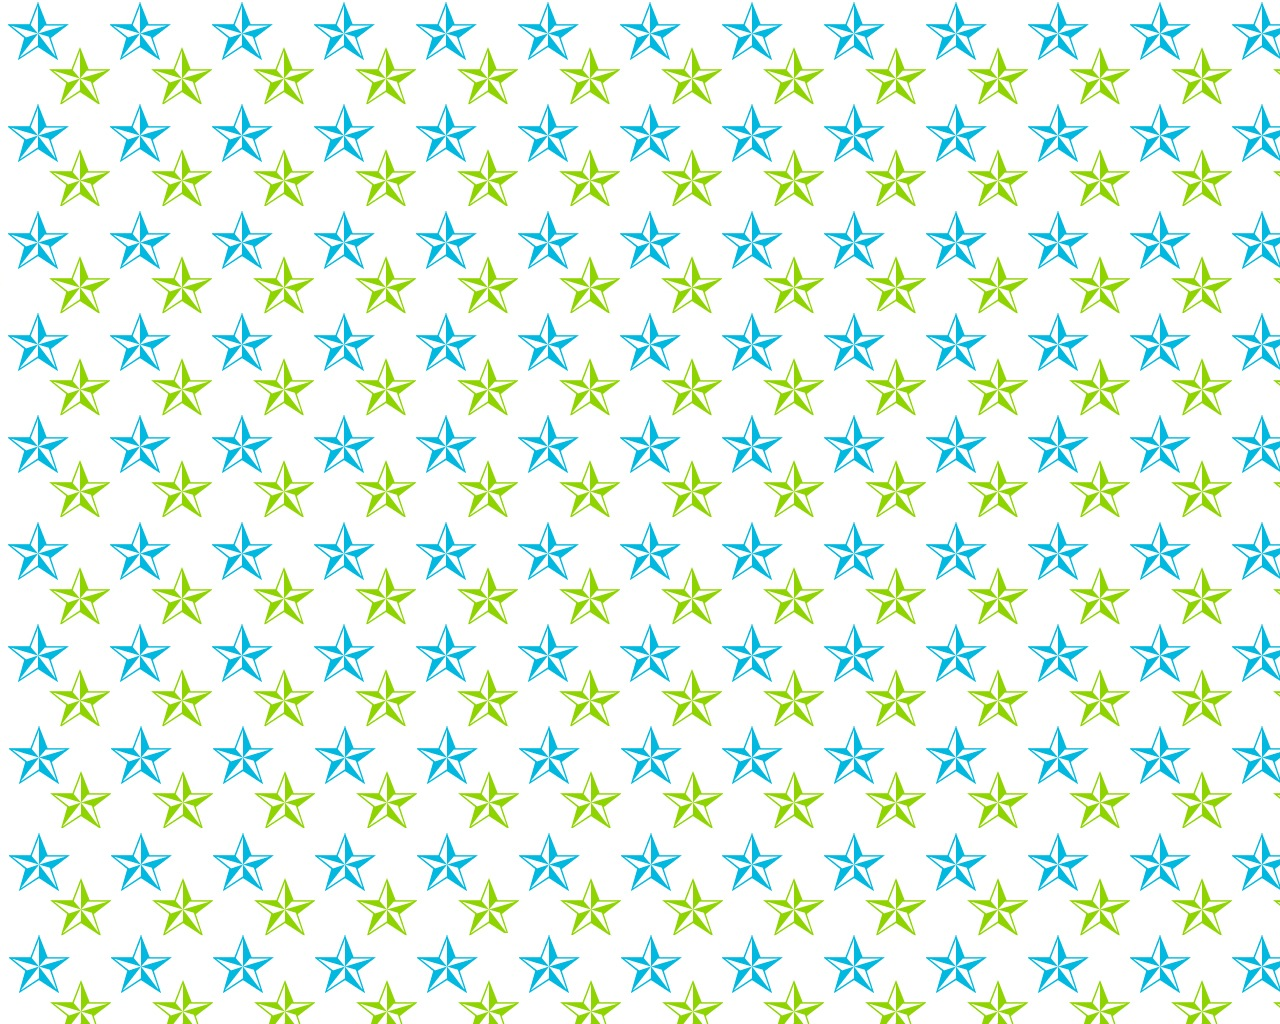 nautical stars abstract wallpaper - photo #33